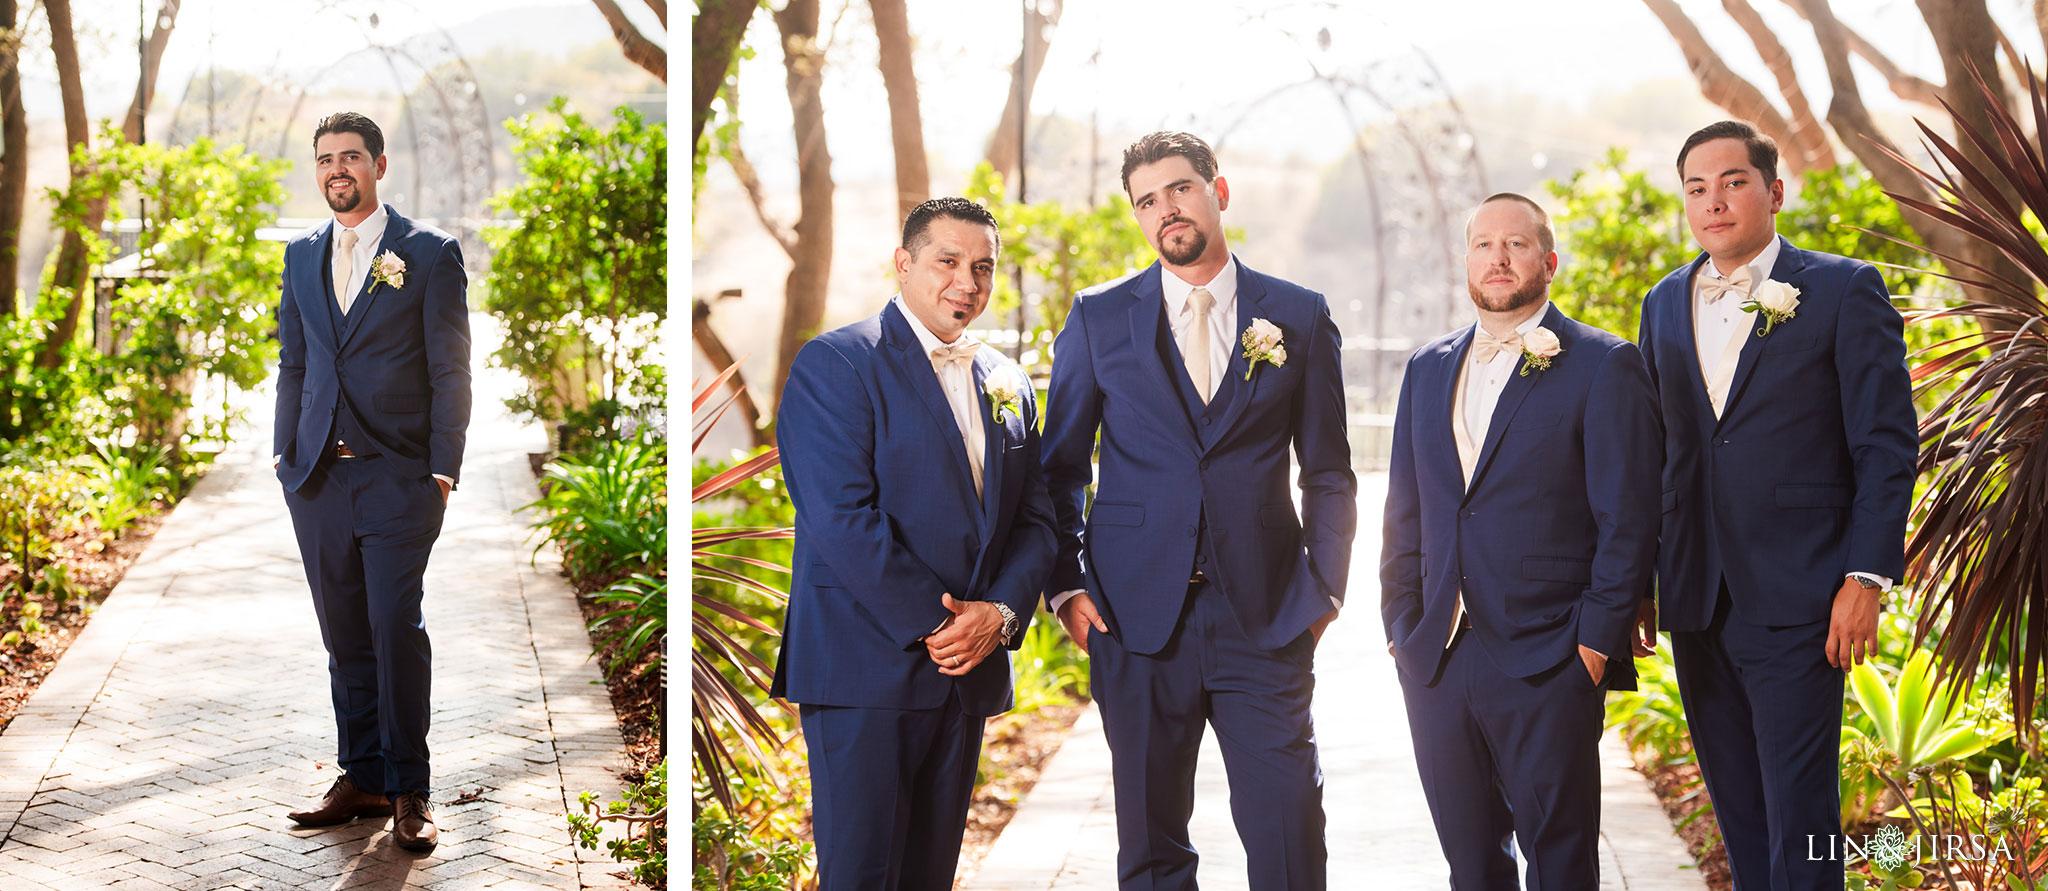 008 padua hills claremont groom wedding photography